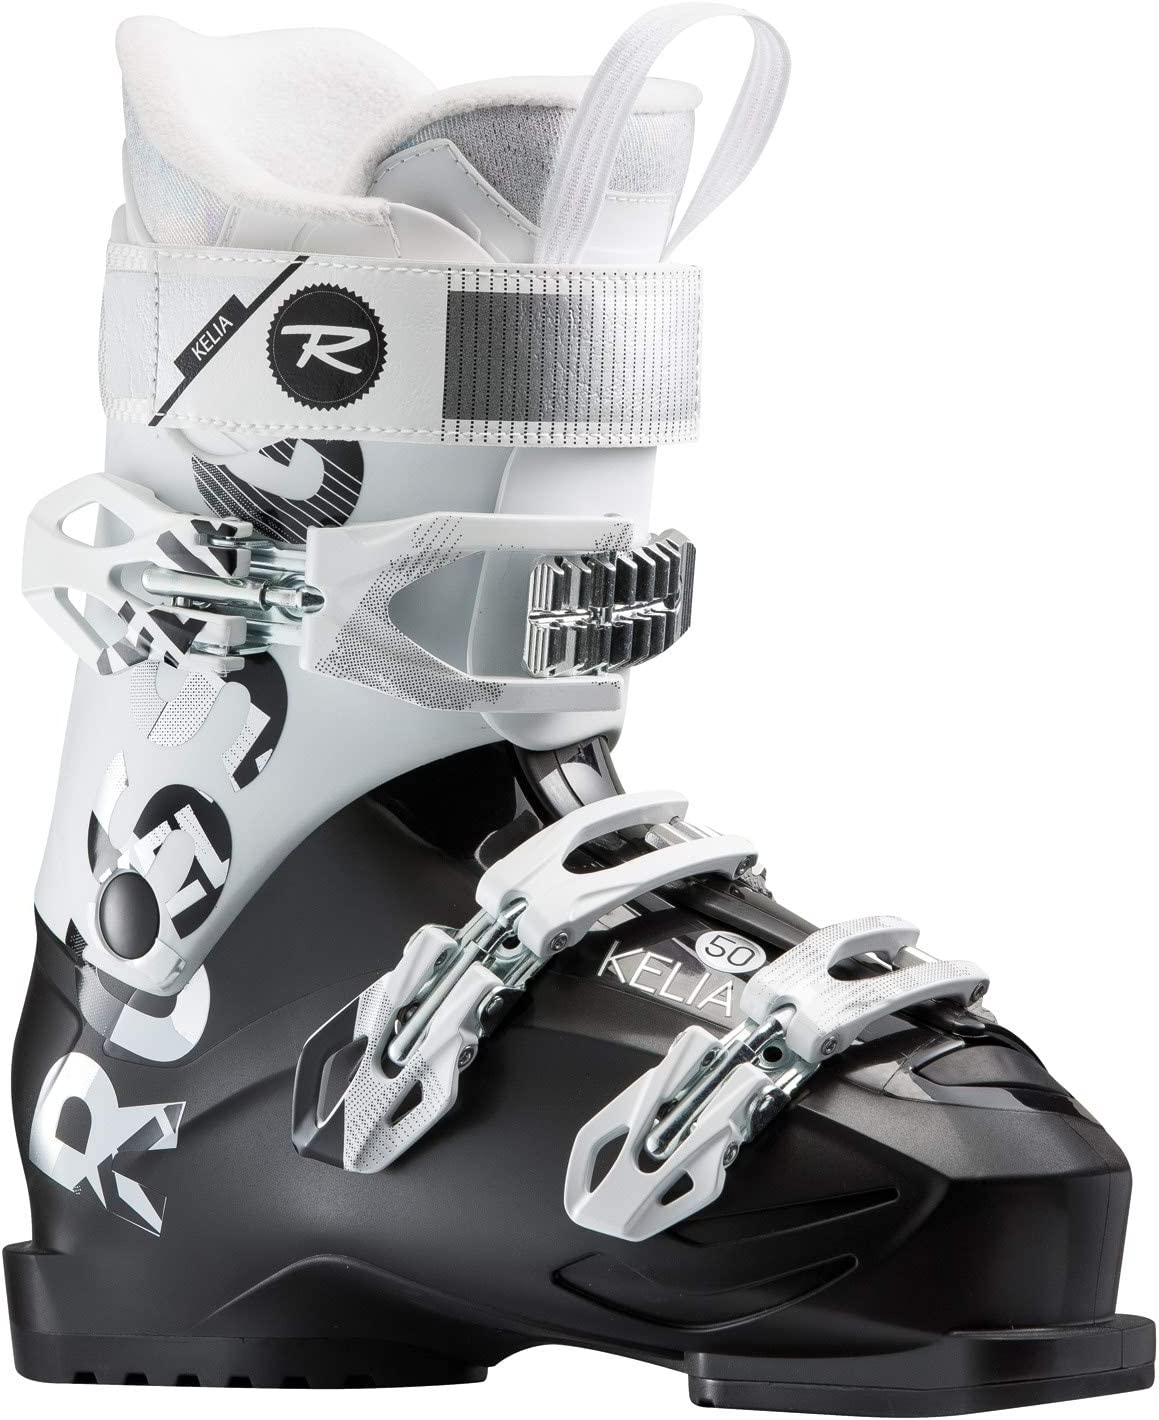 rossignol kelia 50 ski boots women's